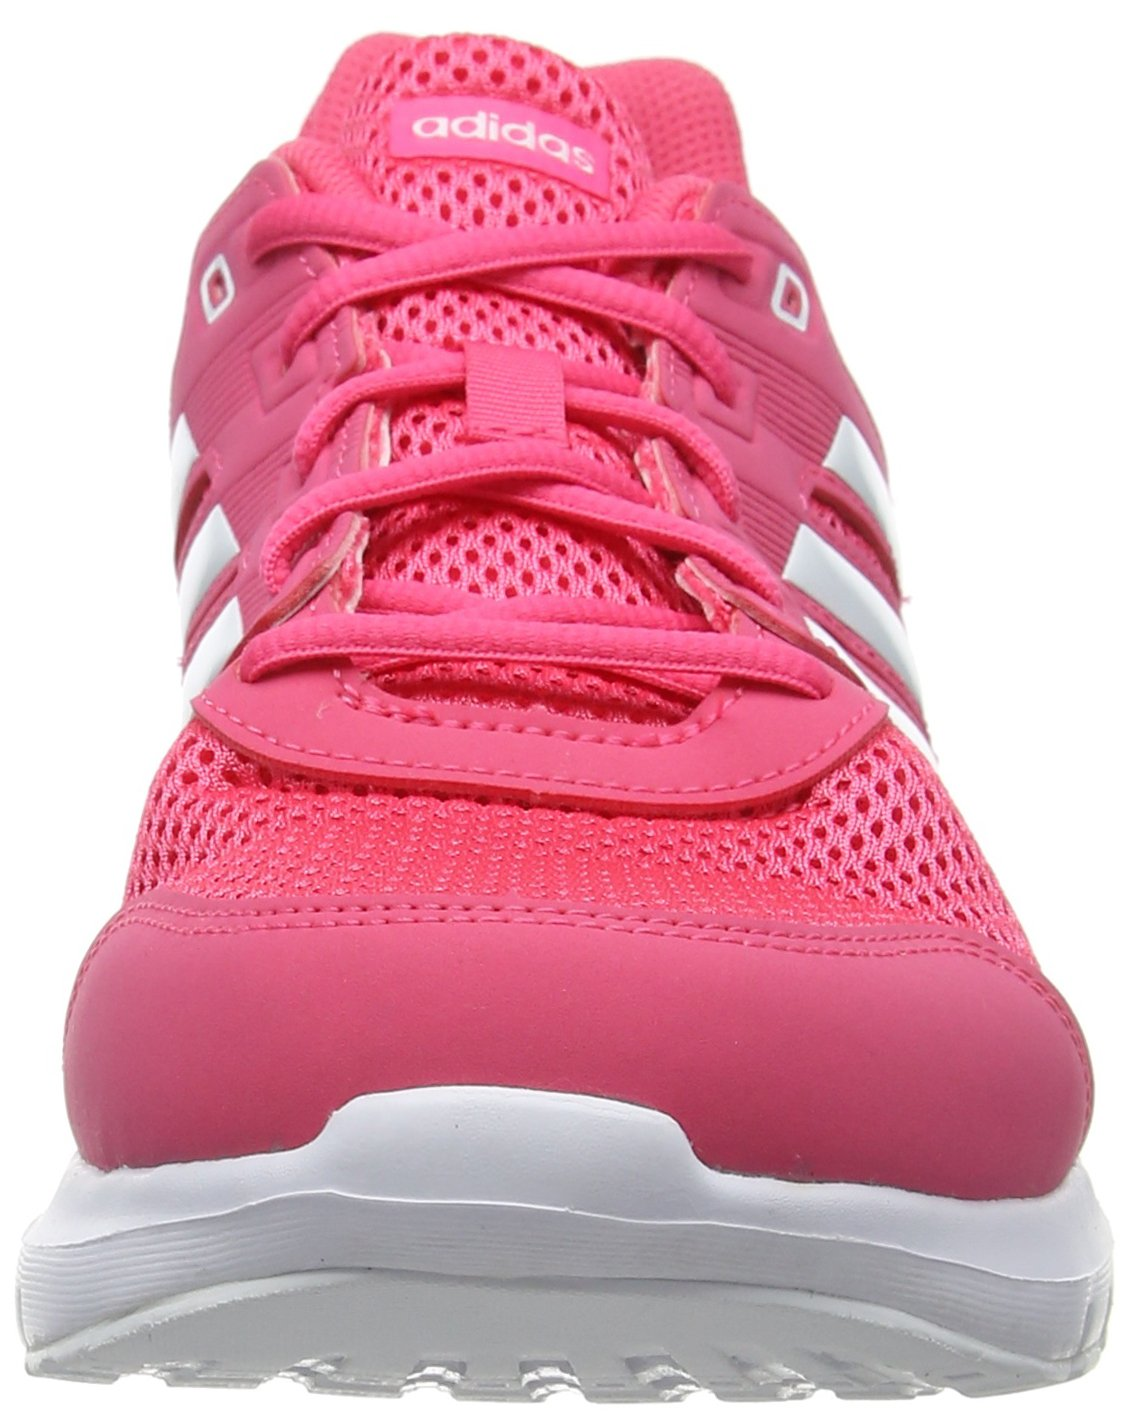 adidas Duramo Lite 2.0, Scarpe da Trail Running Donna 4 spesavip